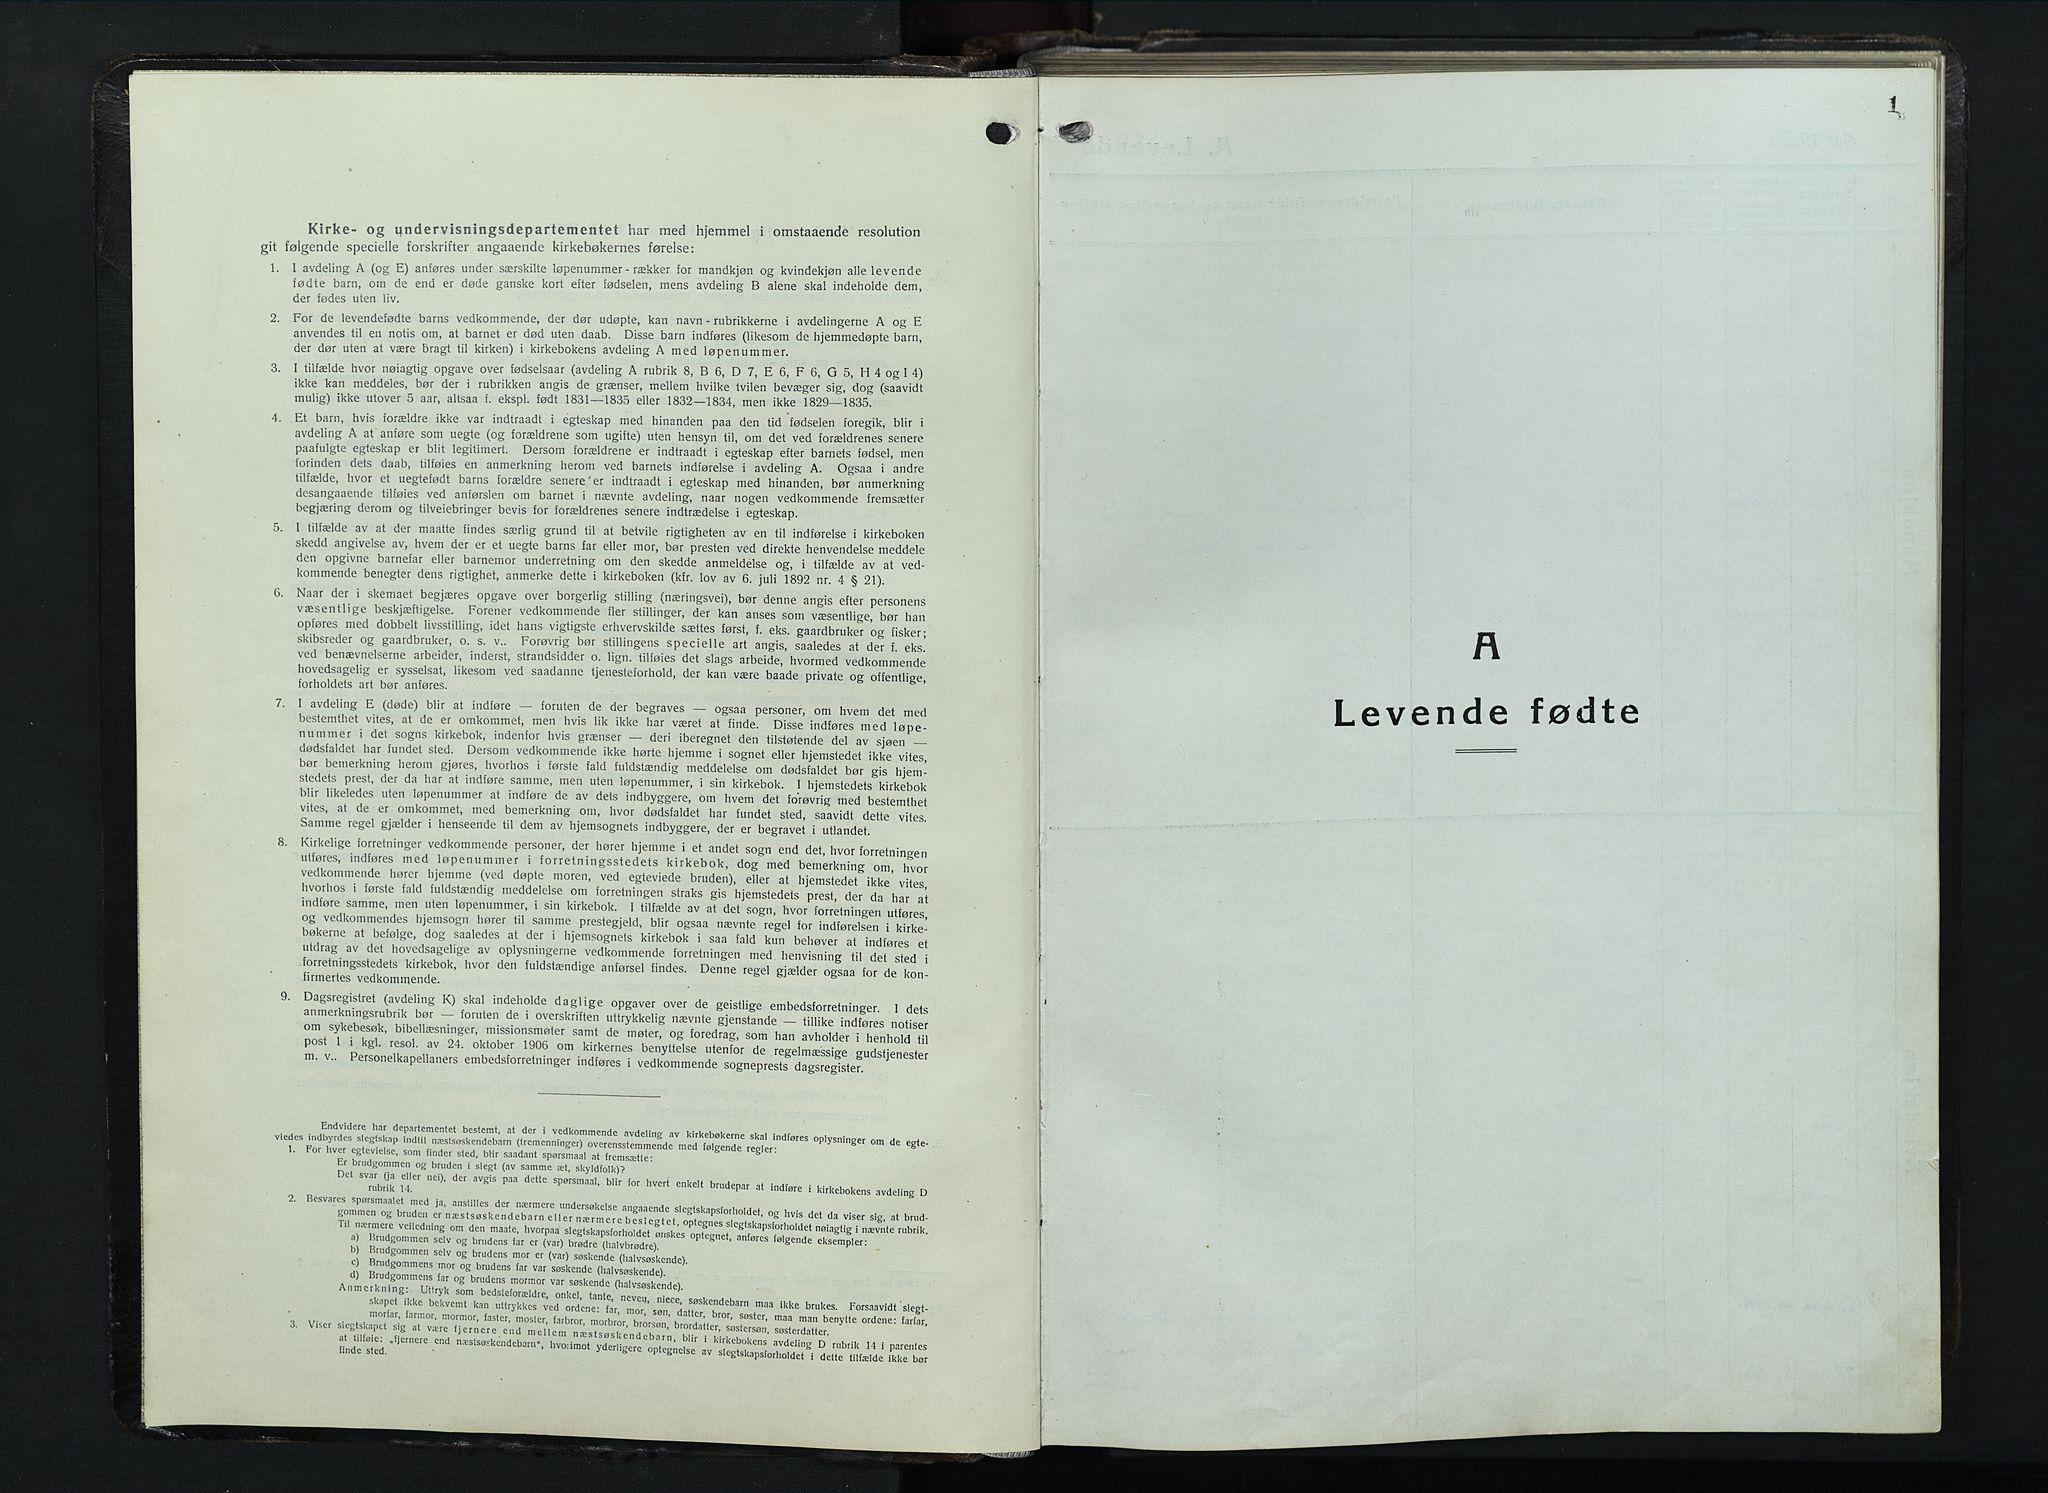 SAH, Balke prestekontor, Klokkerbok nr. 1, 1920-1955, s. 1